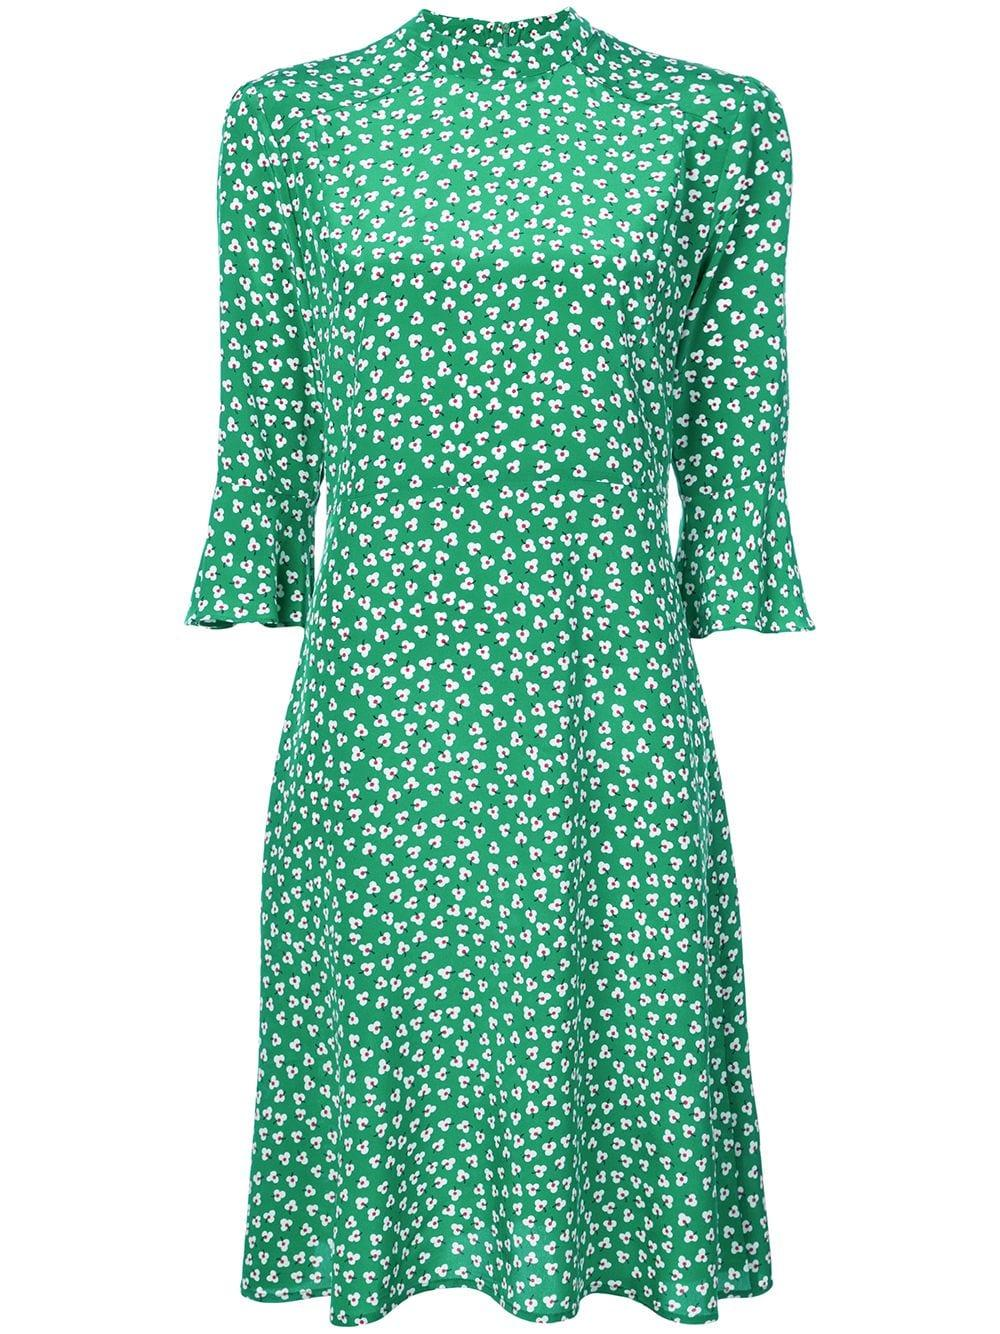 b1c4509e442976 Harley Viera-Newton Hvn Printed Day Dress - Green | ModeSens